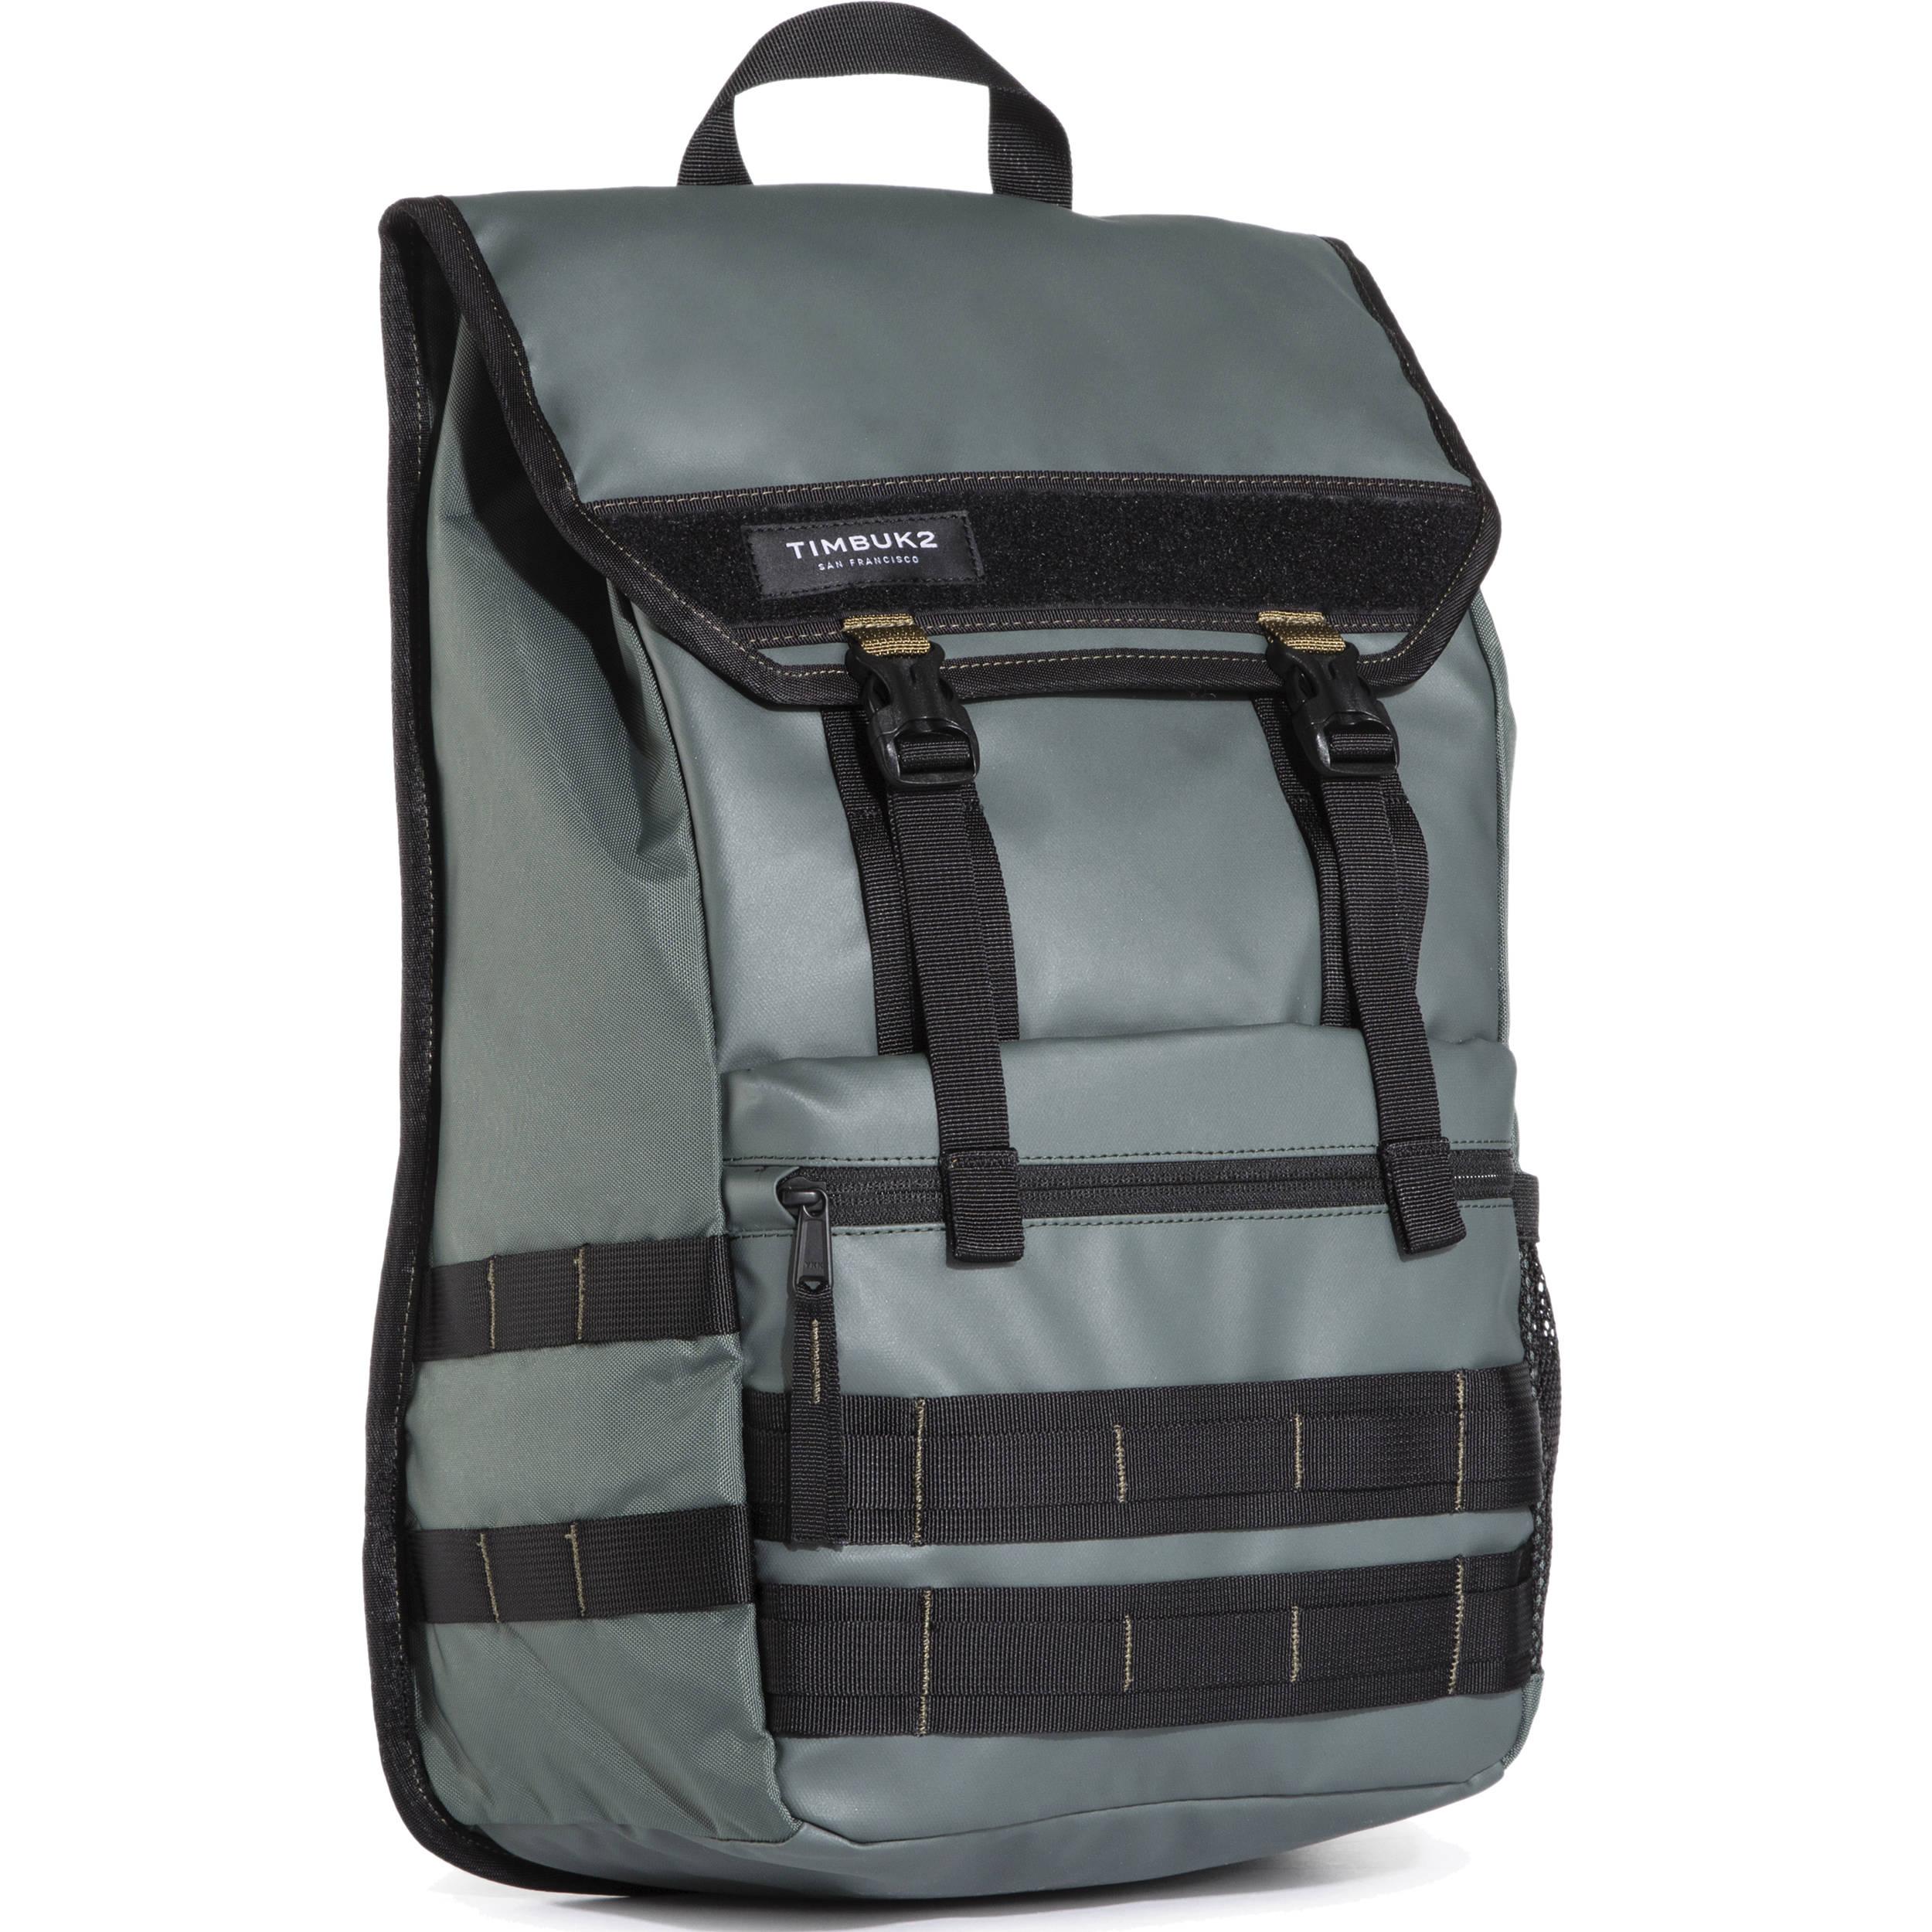 cc88d1040 Timbuk2 Rogue Laptop Backpack (Surplus) 422-3-4730 B&H Photo